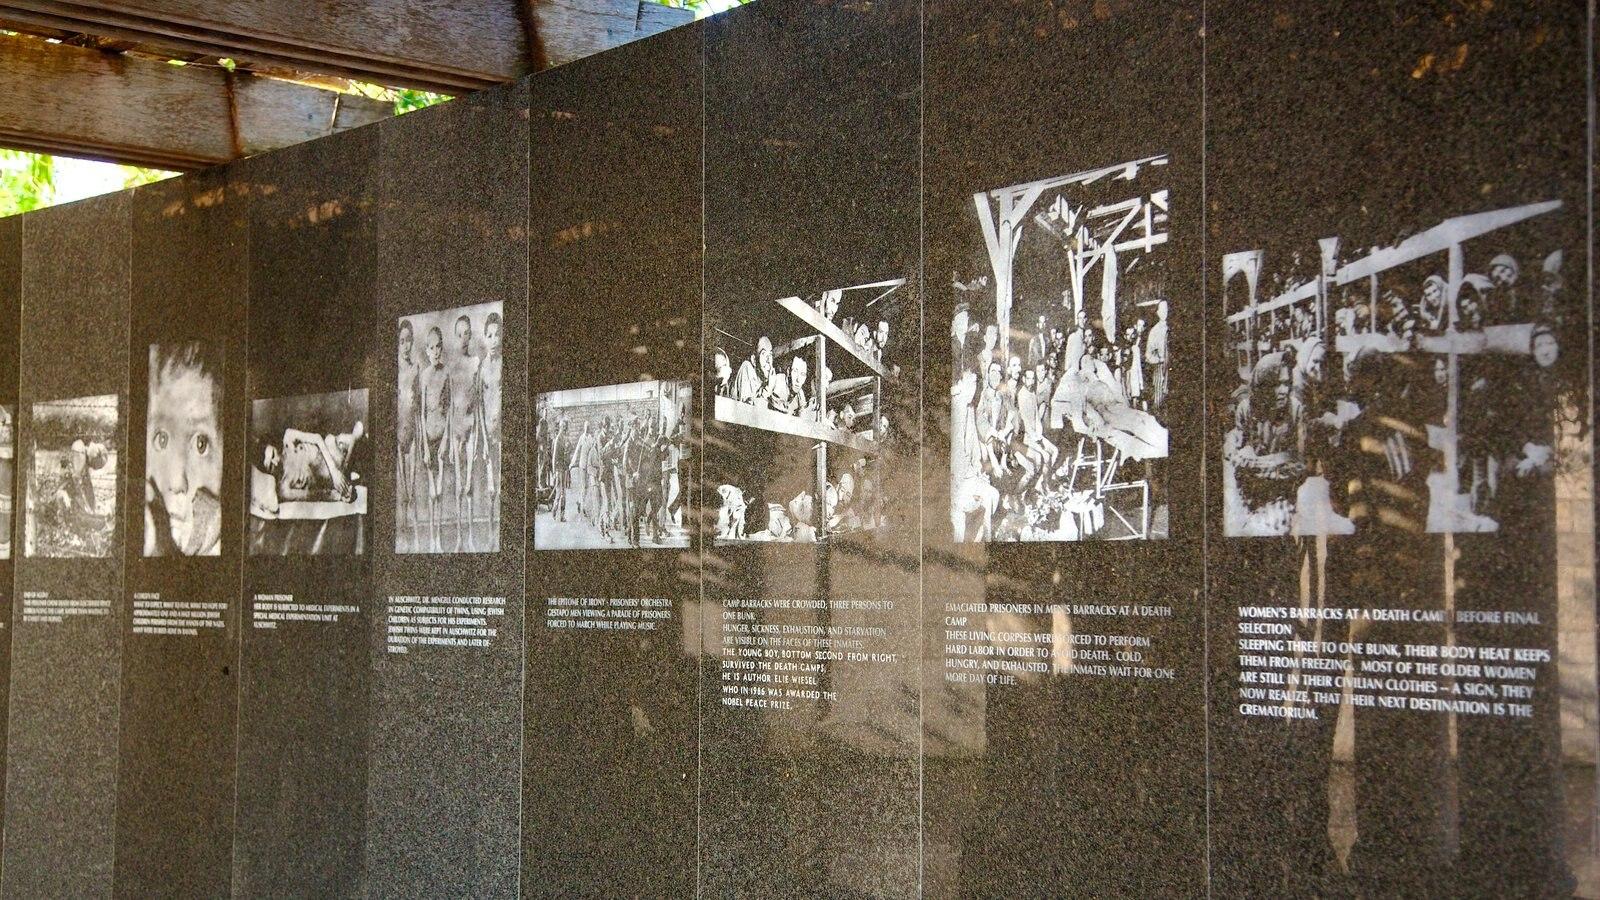 2014 holocaust memorial essay poetry performance and art contest